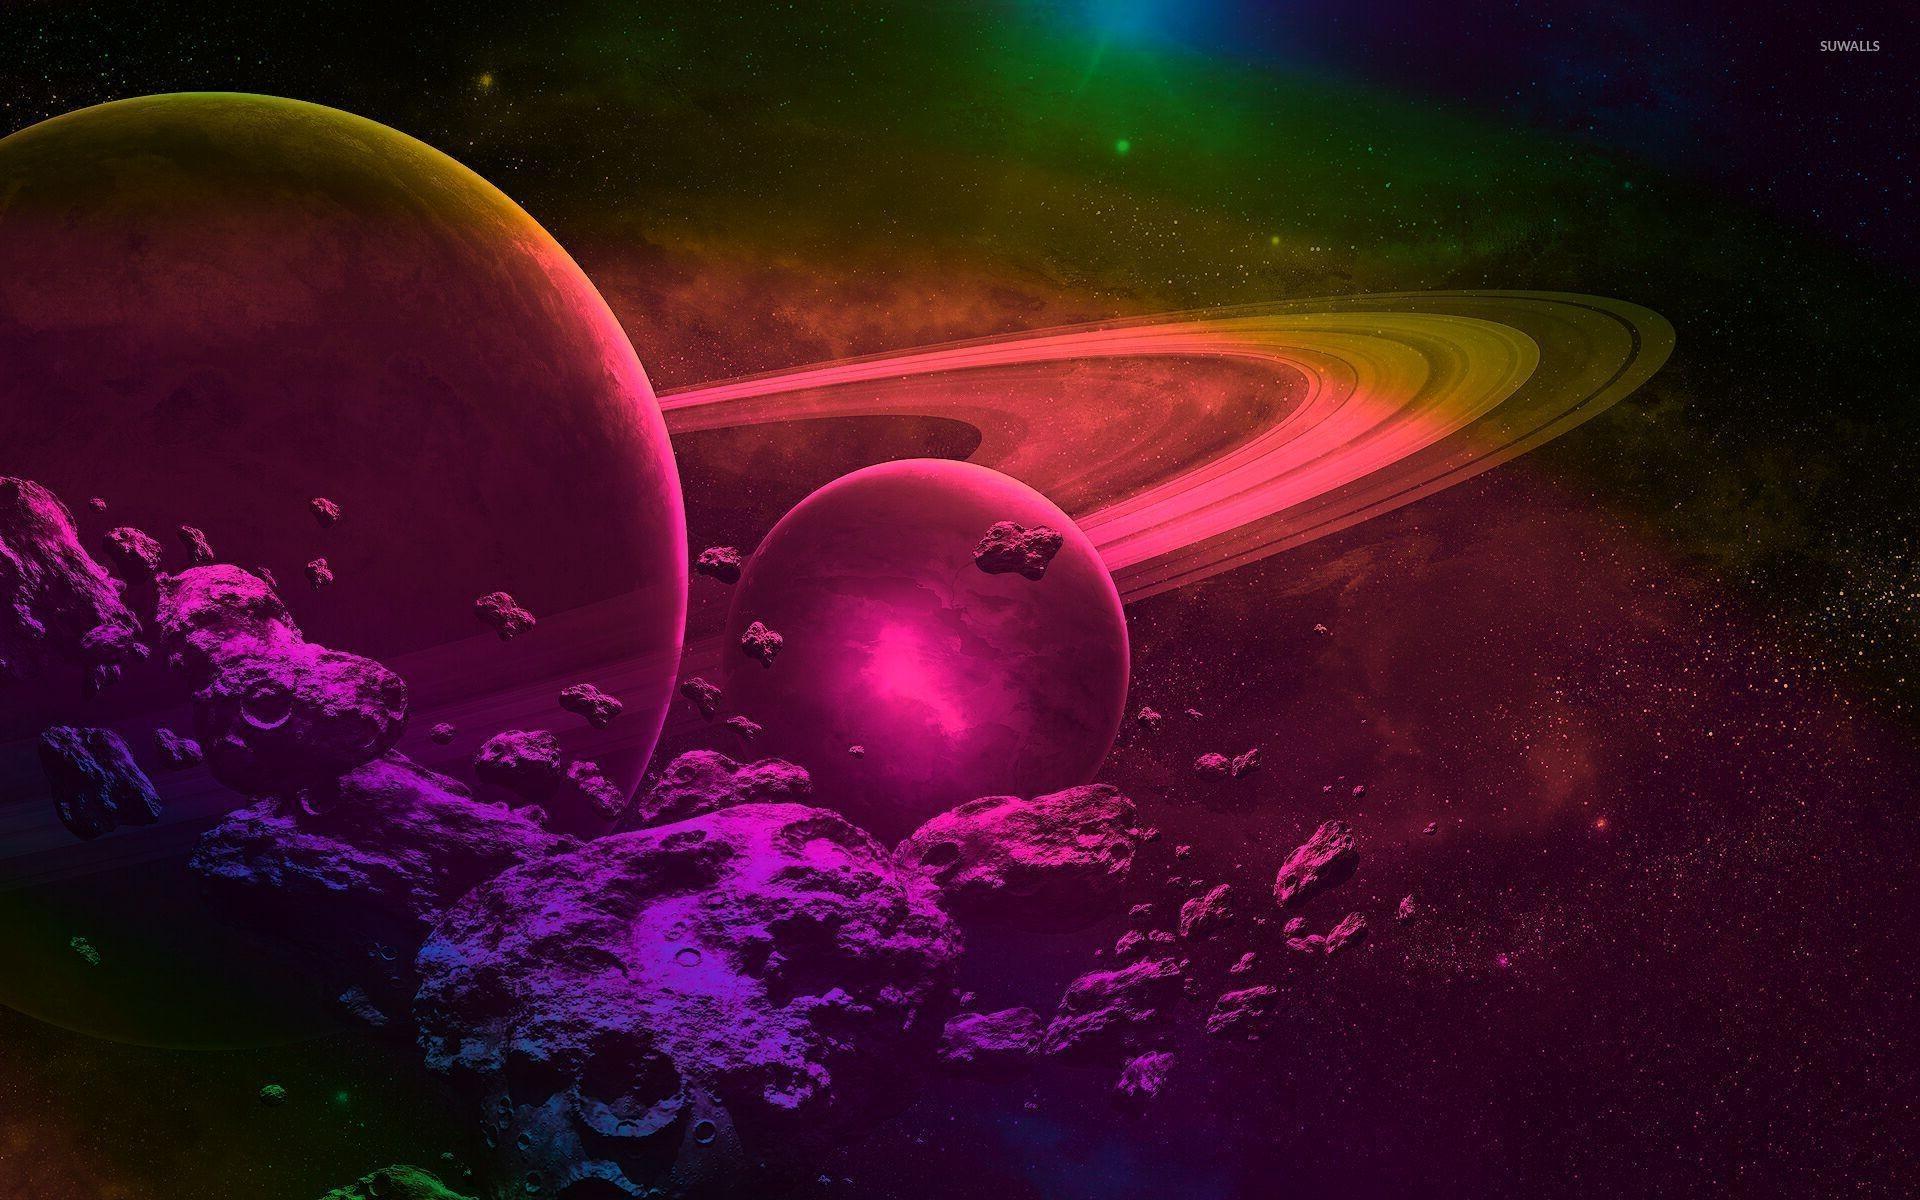 Pink and purple space wallpaper jpg